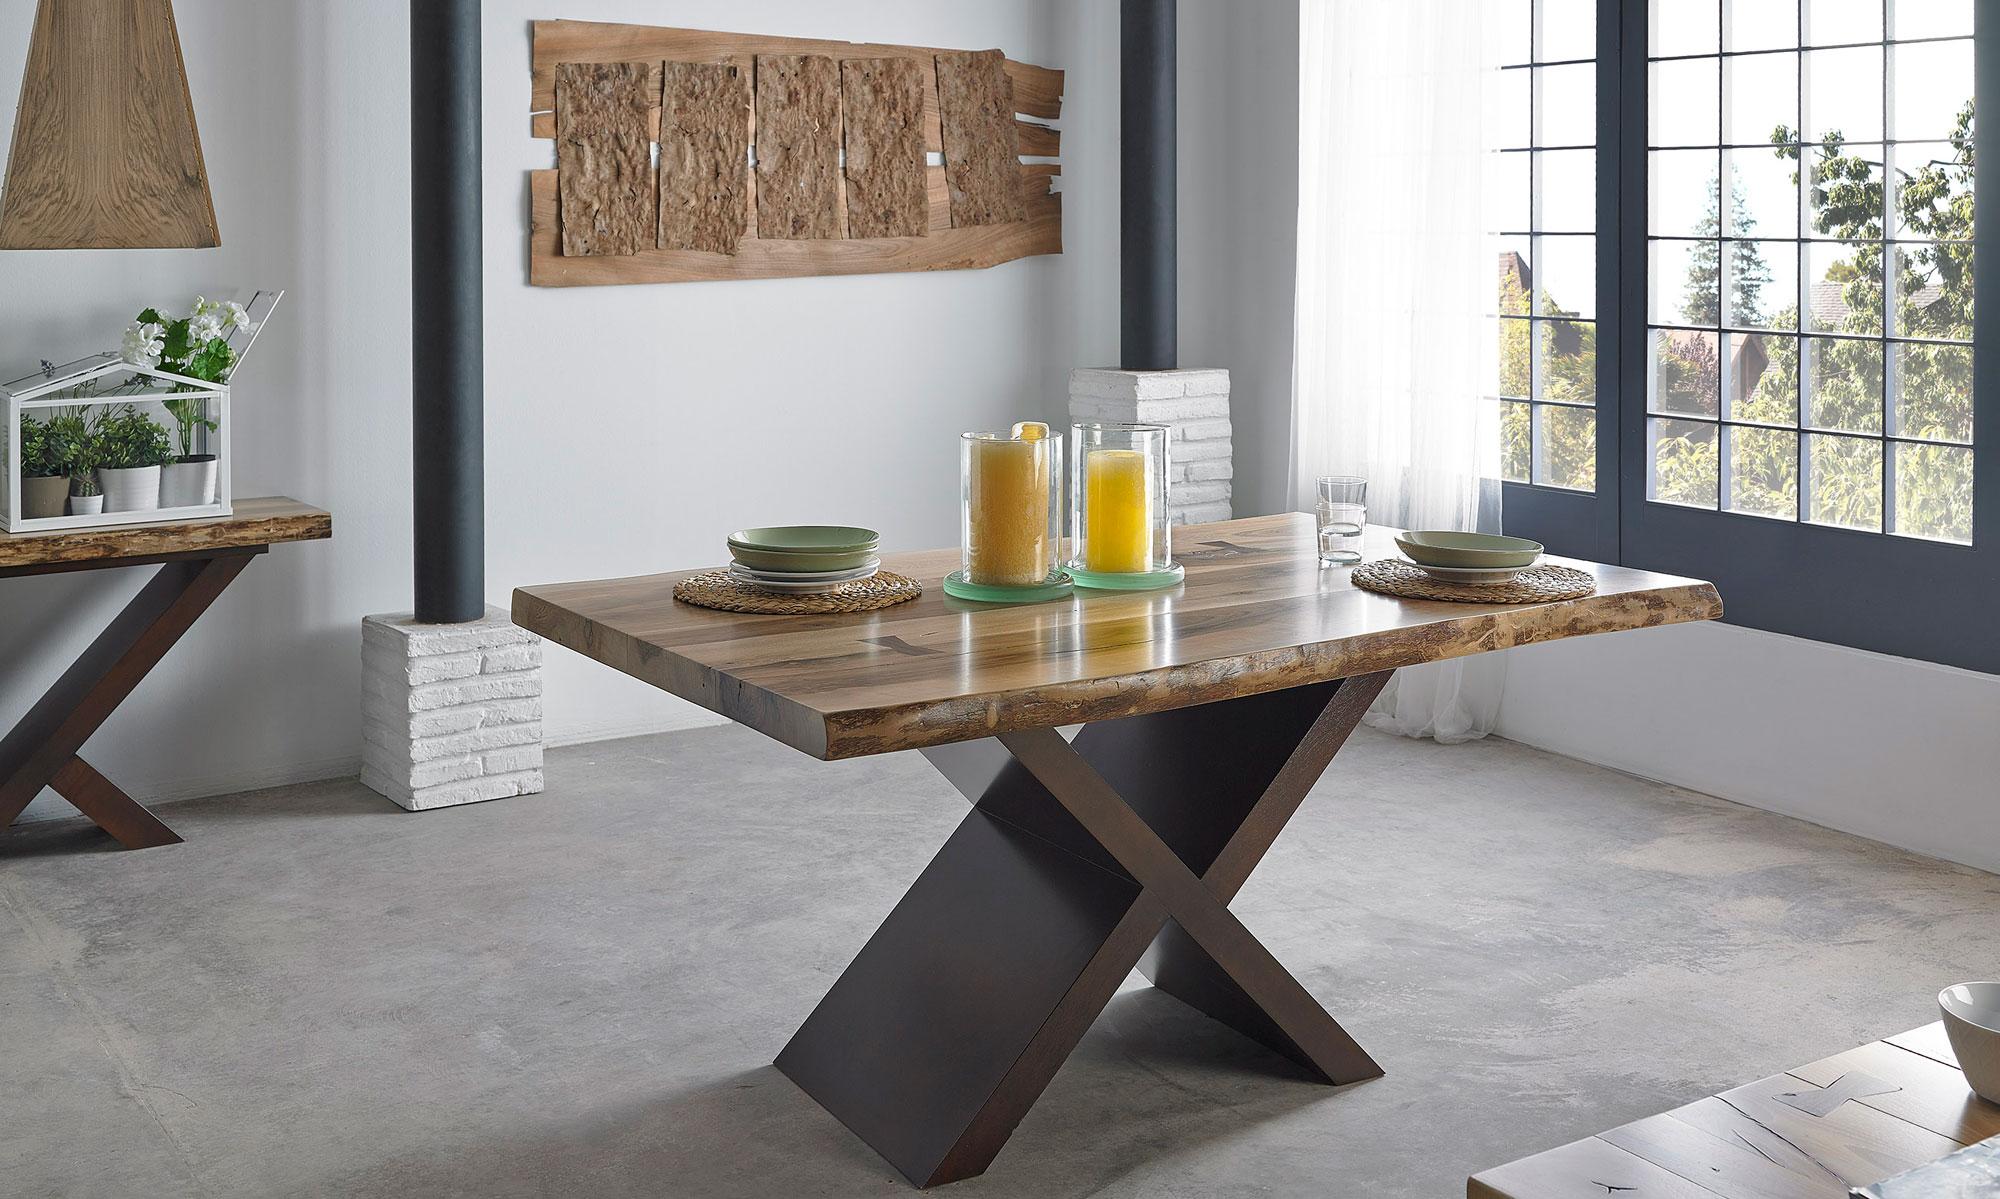 Mesa de comedor tronco nogal en for Mesas de comedor rectangulares de madera